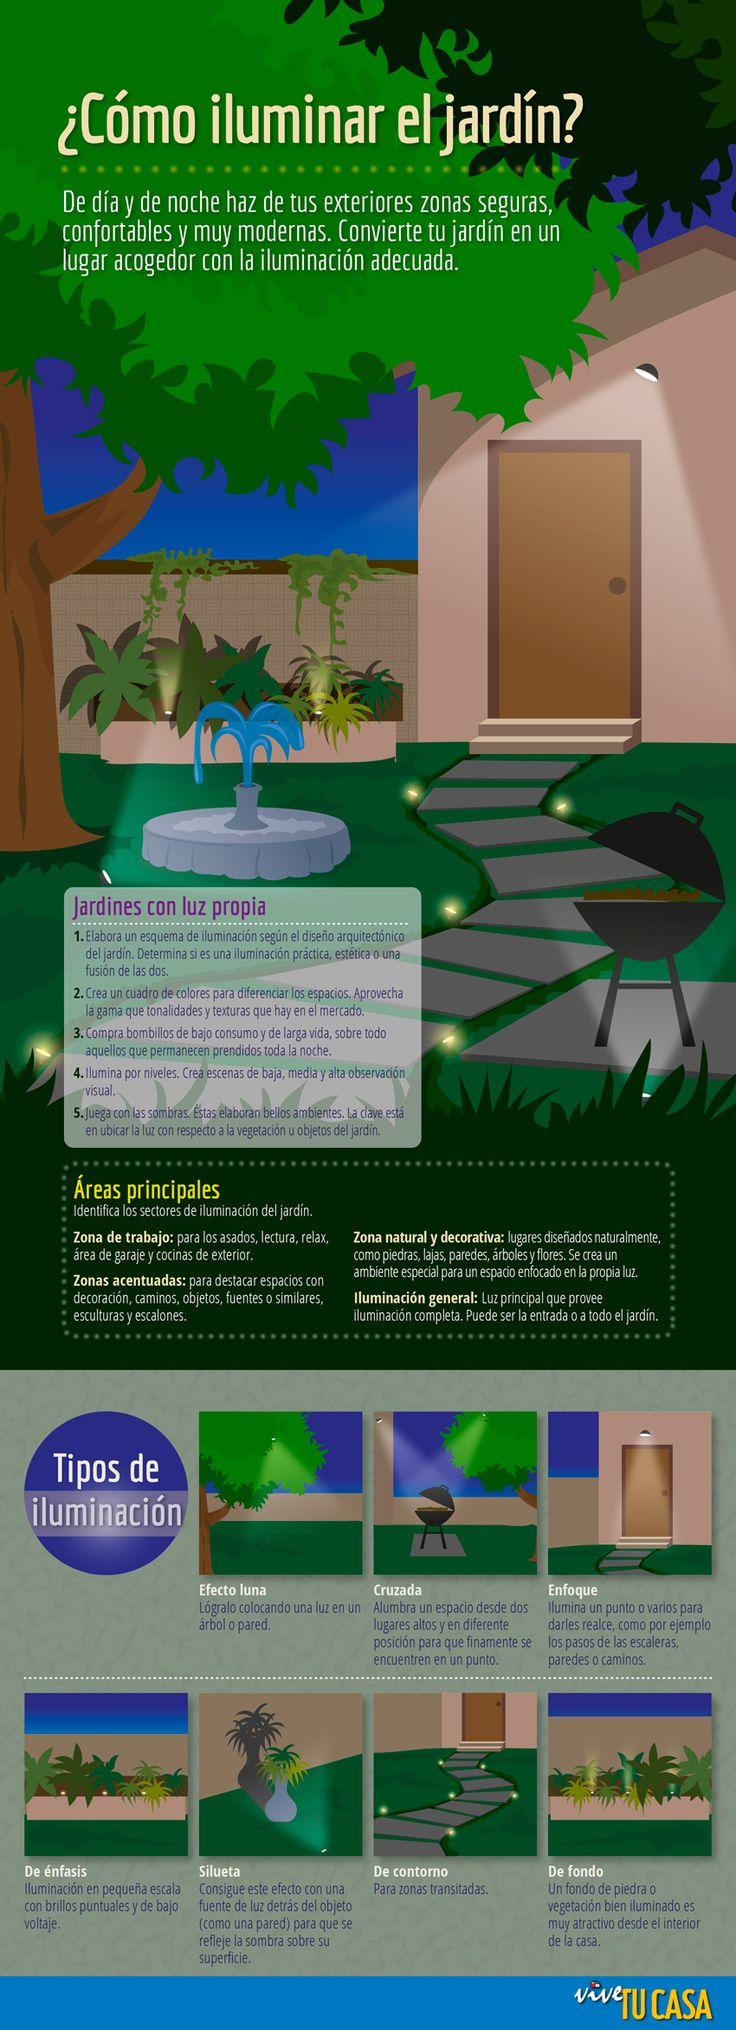 más de 25 ideas increíbles sobre iluminación en pinterest | ideas